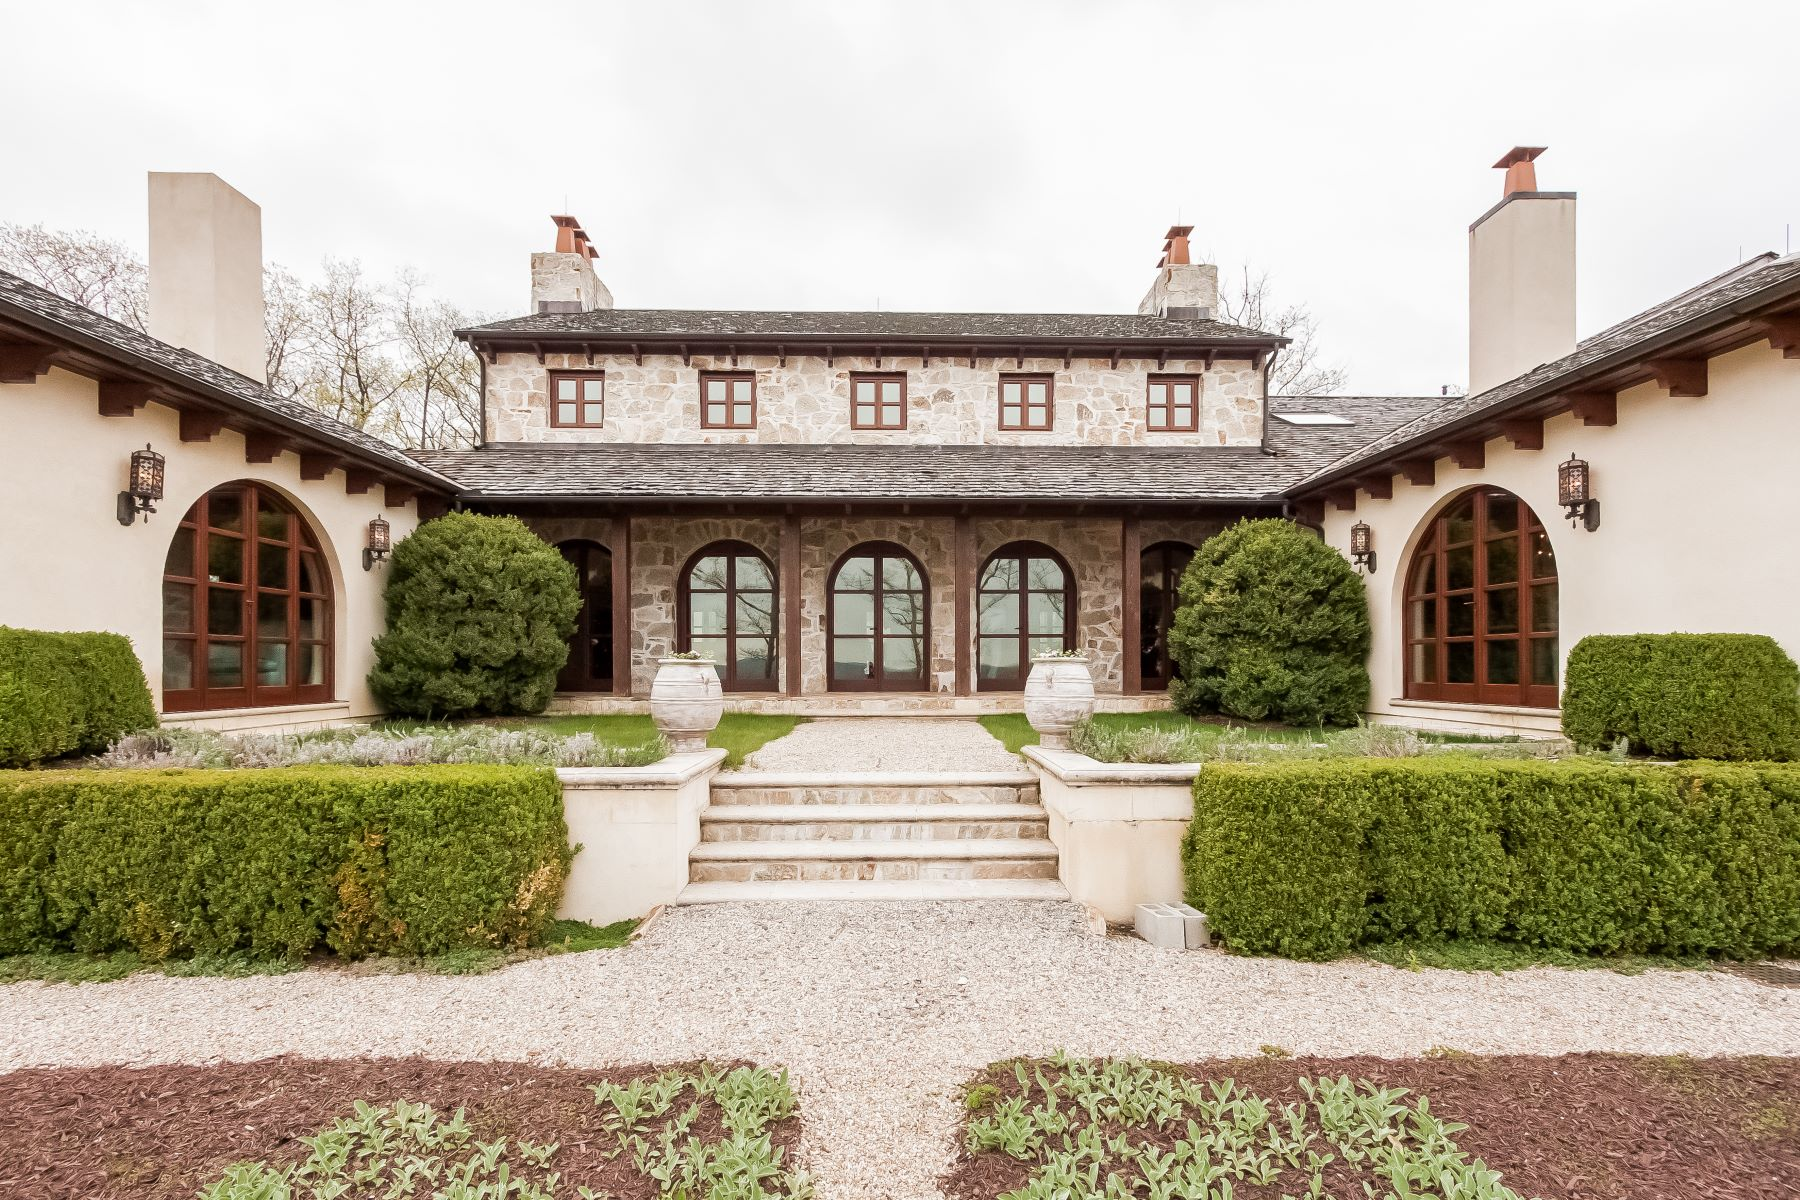 Villa per Vendita alle ore The Pinnacle 175 Carter Rd Kent, Connecticut, 06757 Stati Uniti